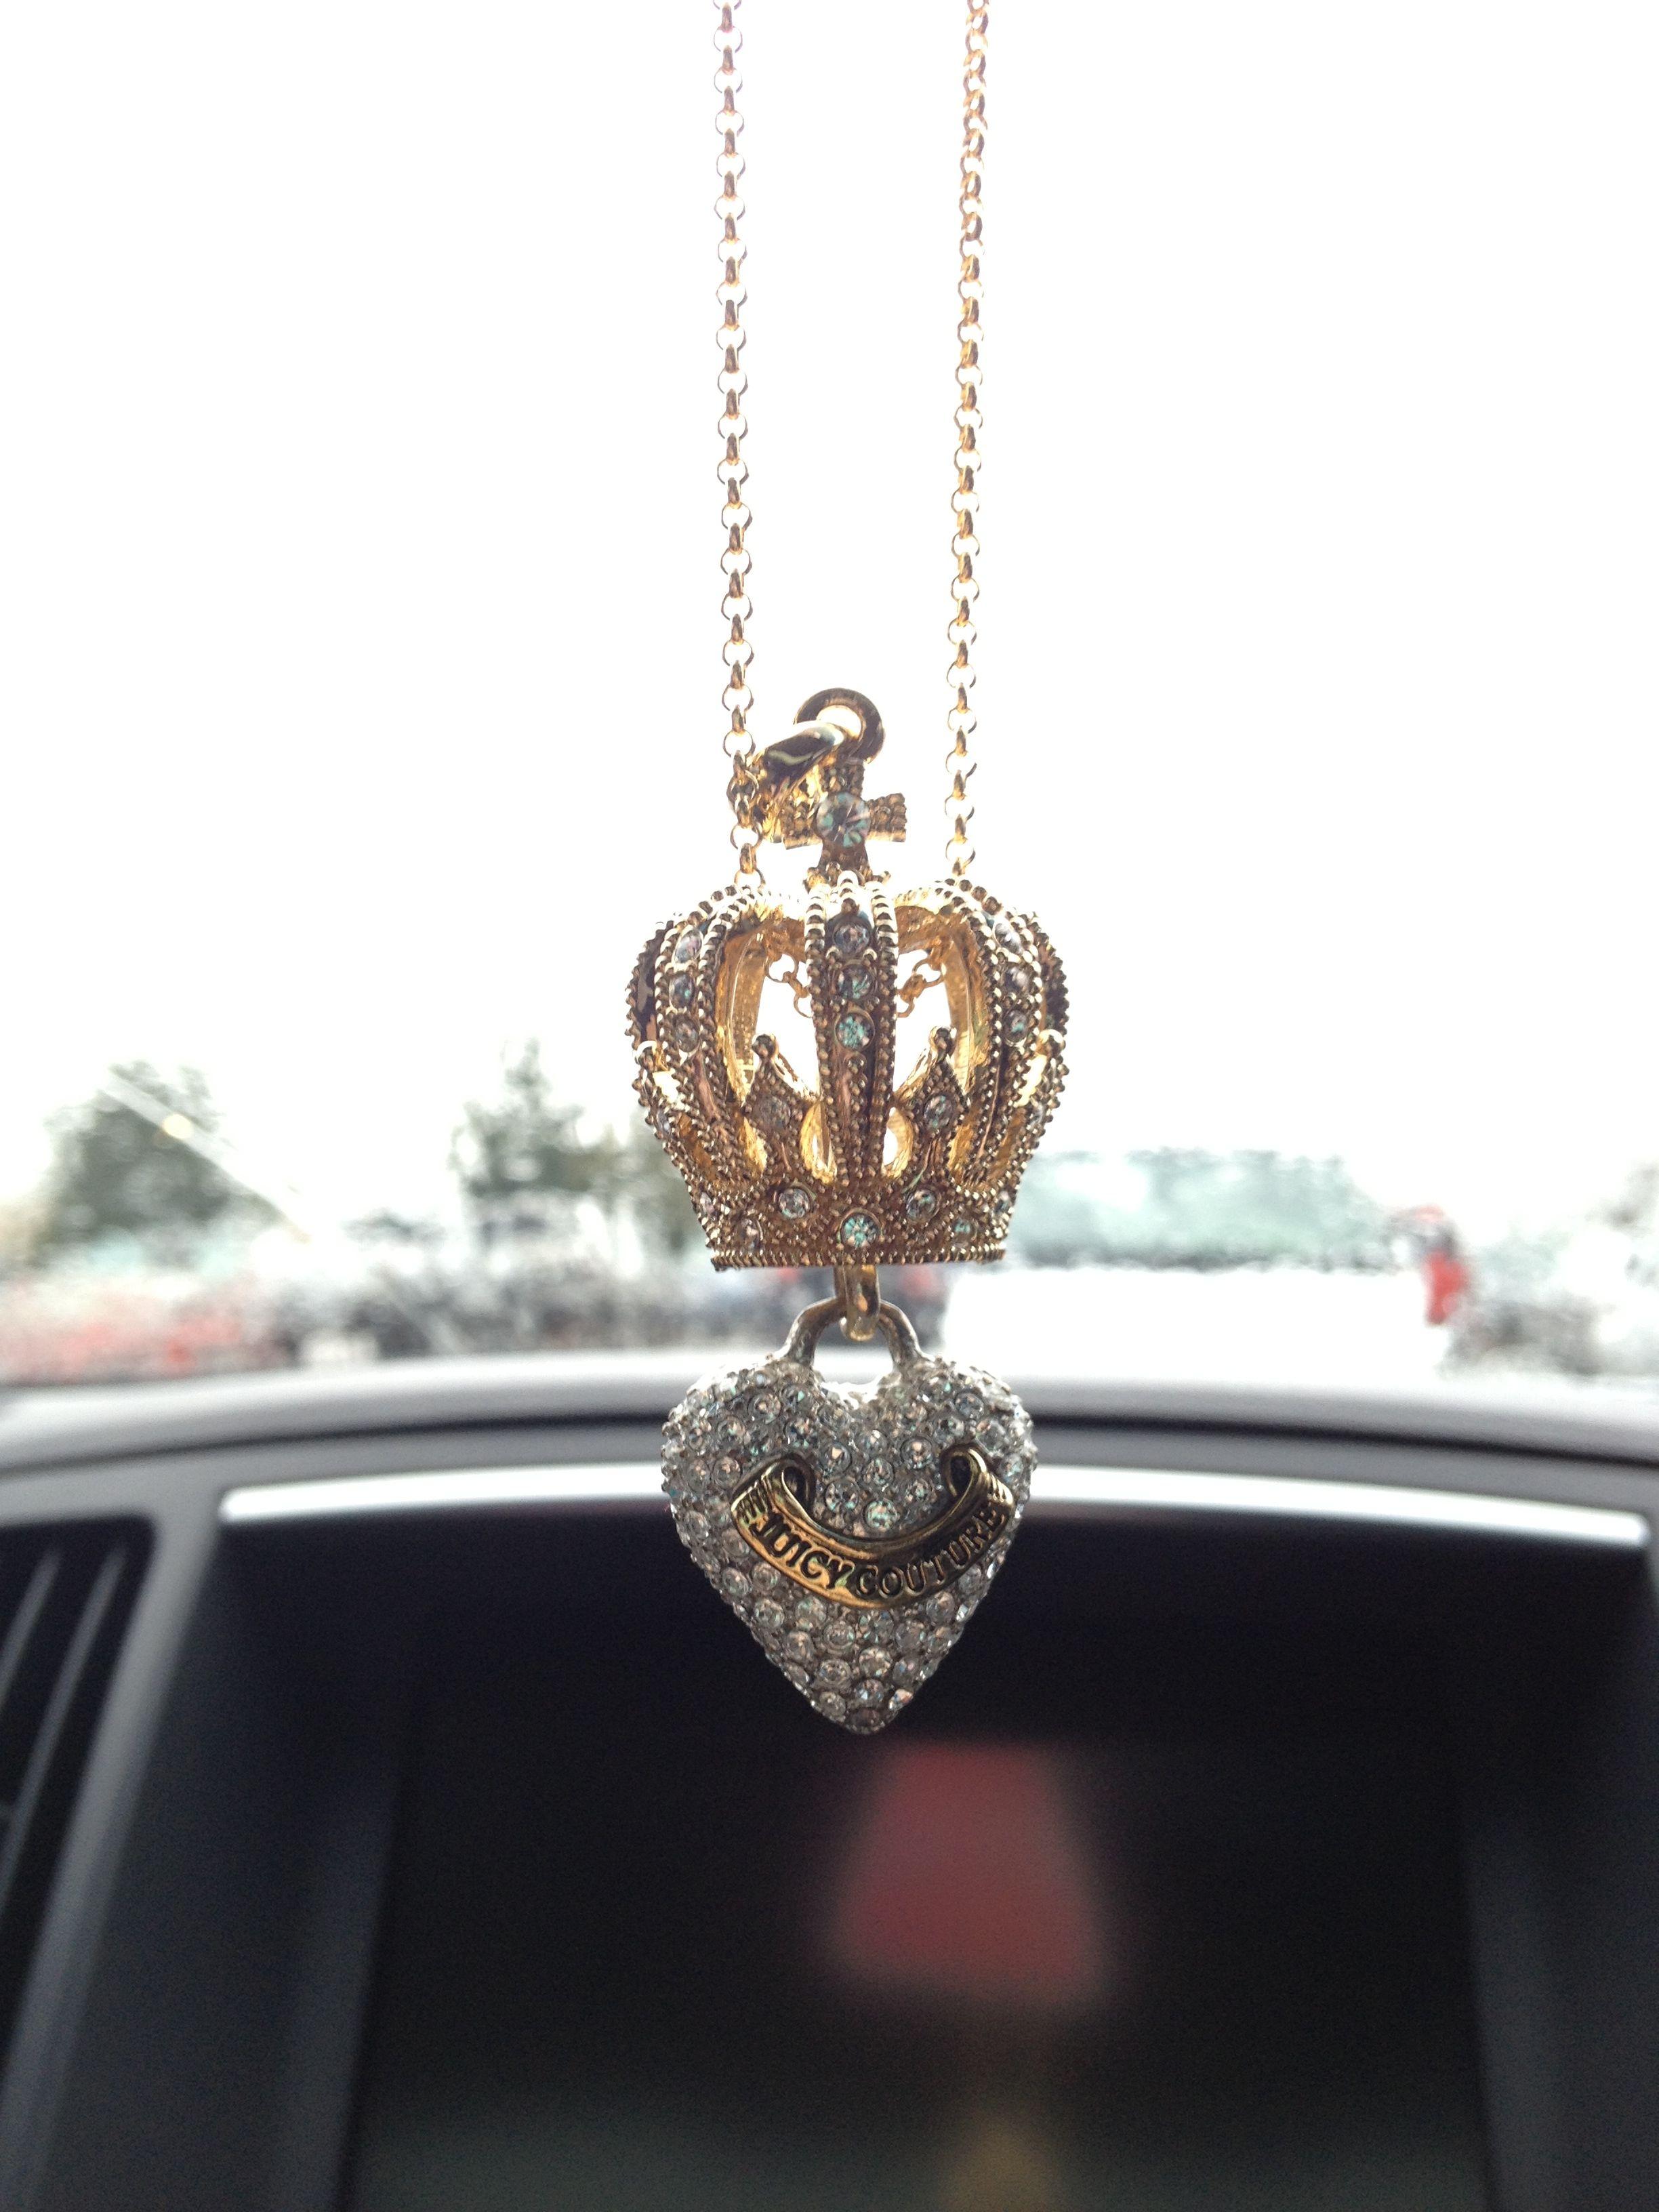 Retro Car Hanging Car Interior Accessories Rearview Mirror Pendant Ornaments